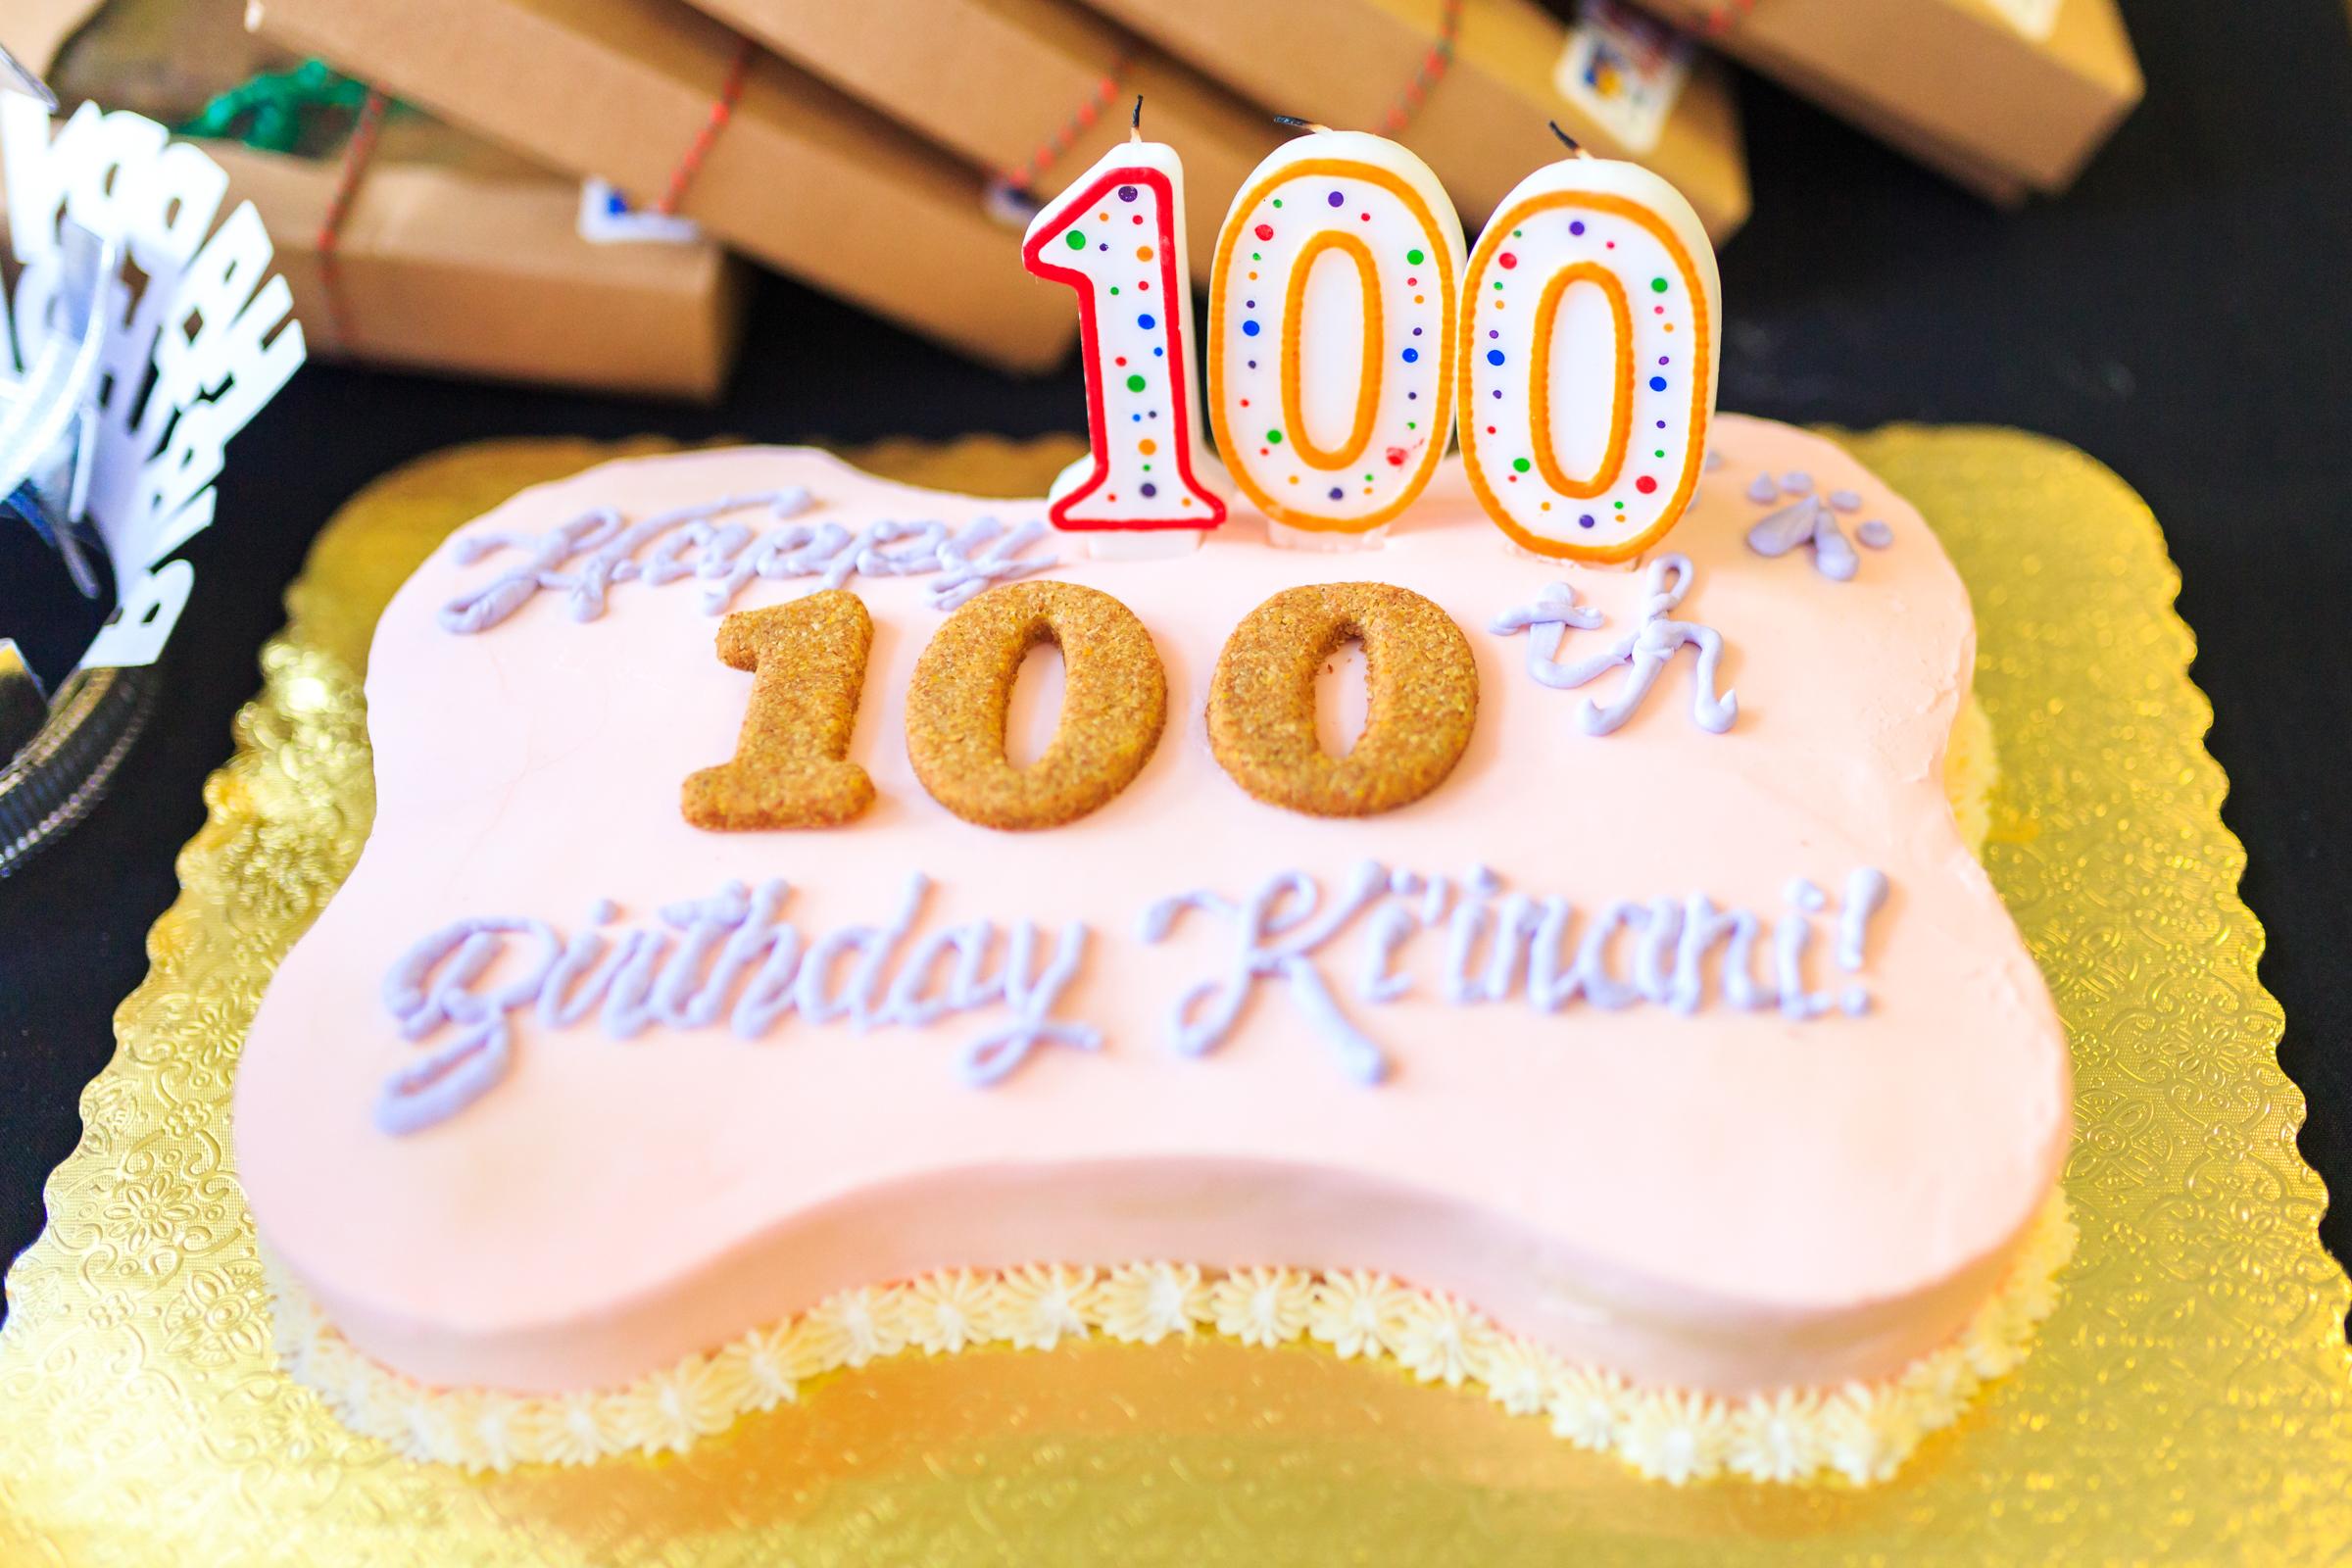 Kii 100th Bday-11